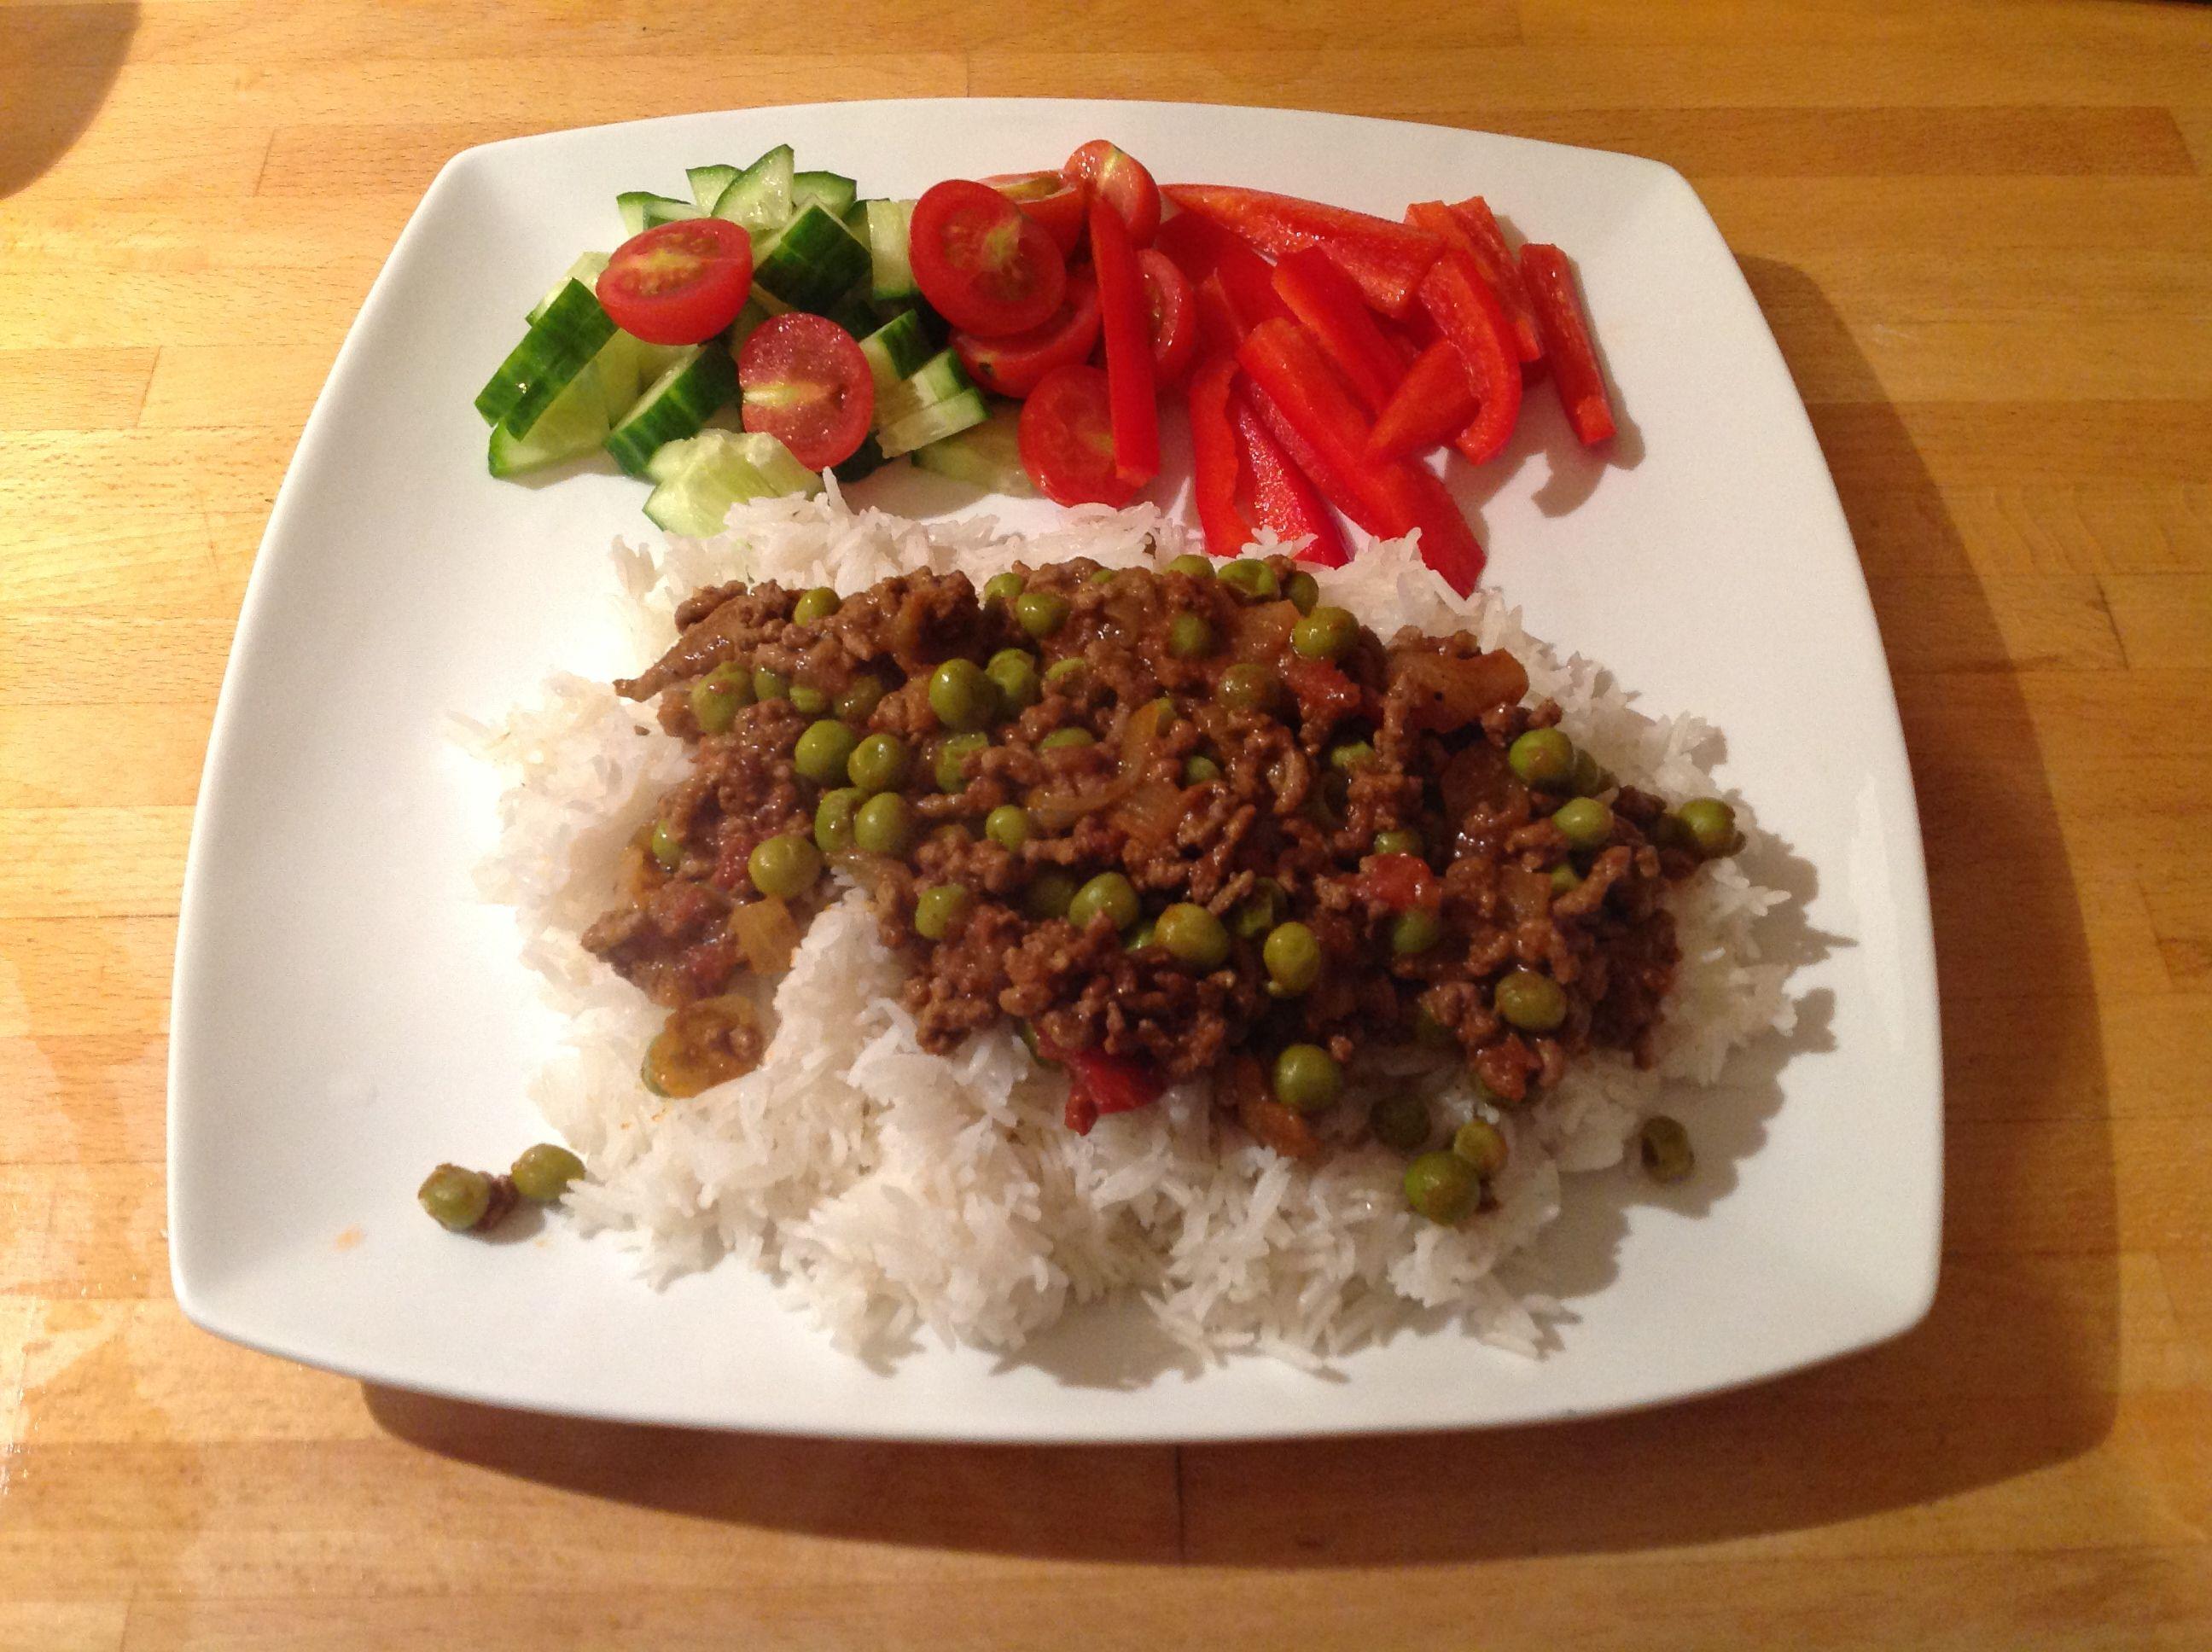 Slimming world syn free beef keema rice salad from the family slimming world syn free beef keema rice salad from the family feasts on a budget recipe book forumfinder Images